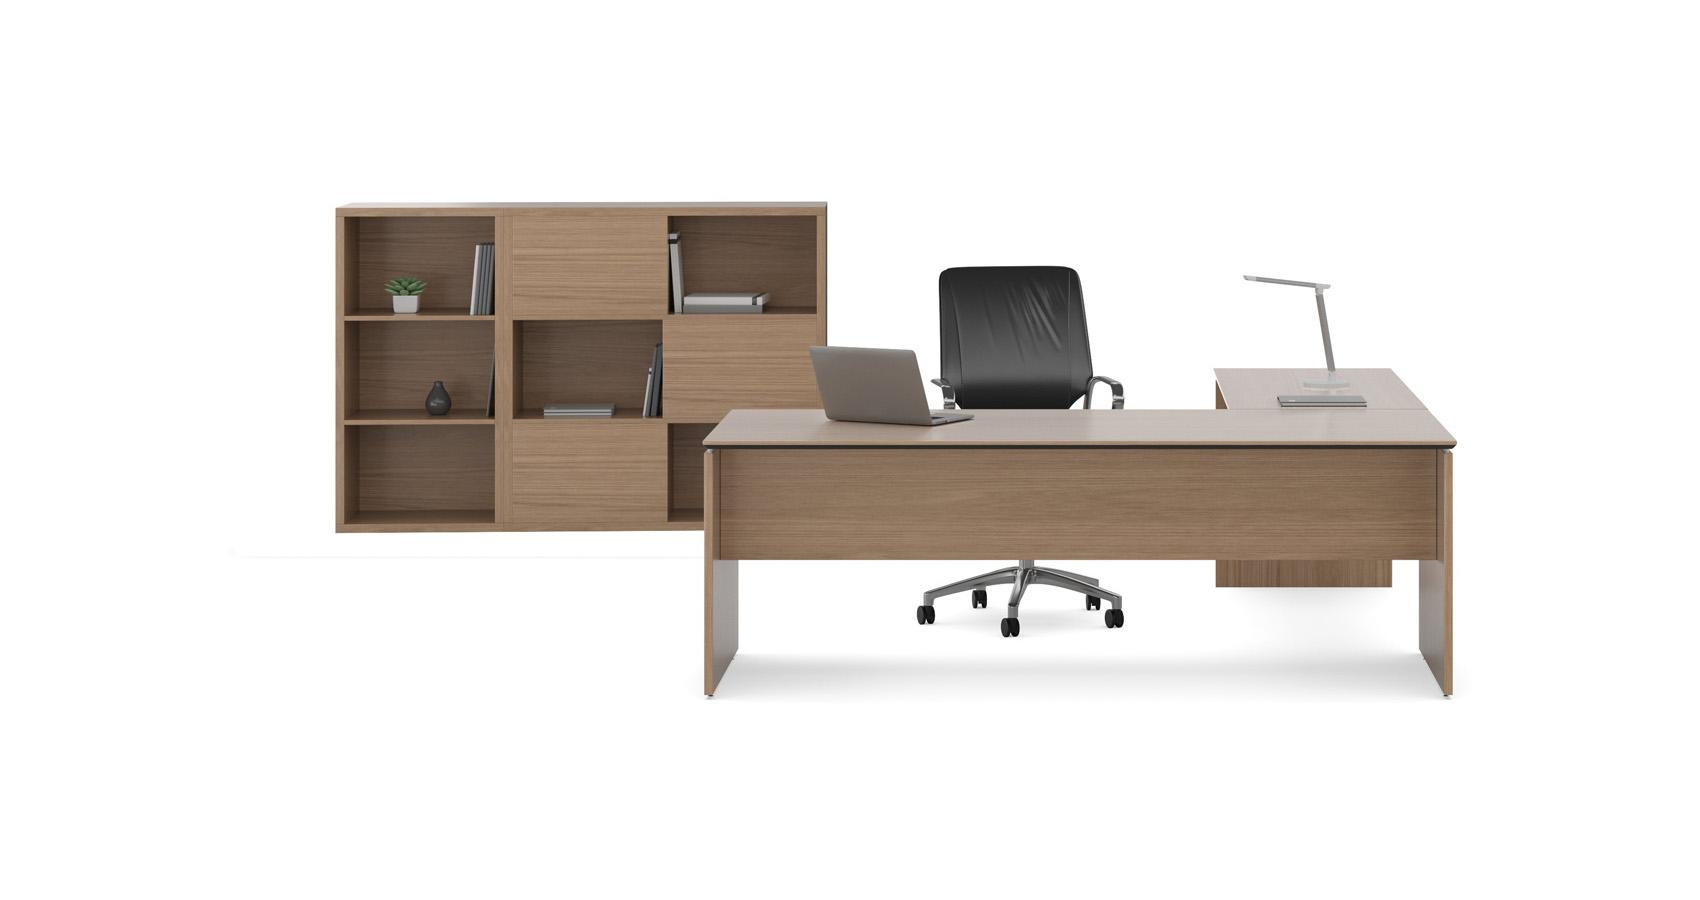 pick up 5e2ef 92f9e Aero - Krost Business Furniture